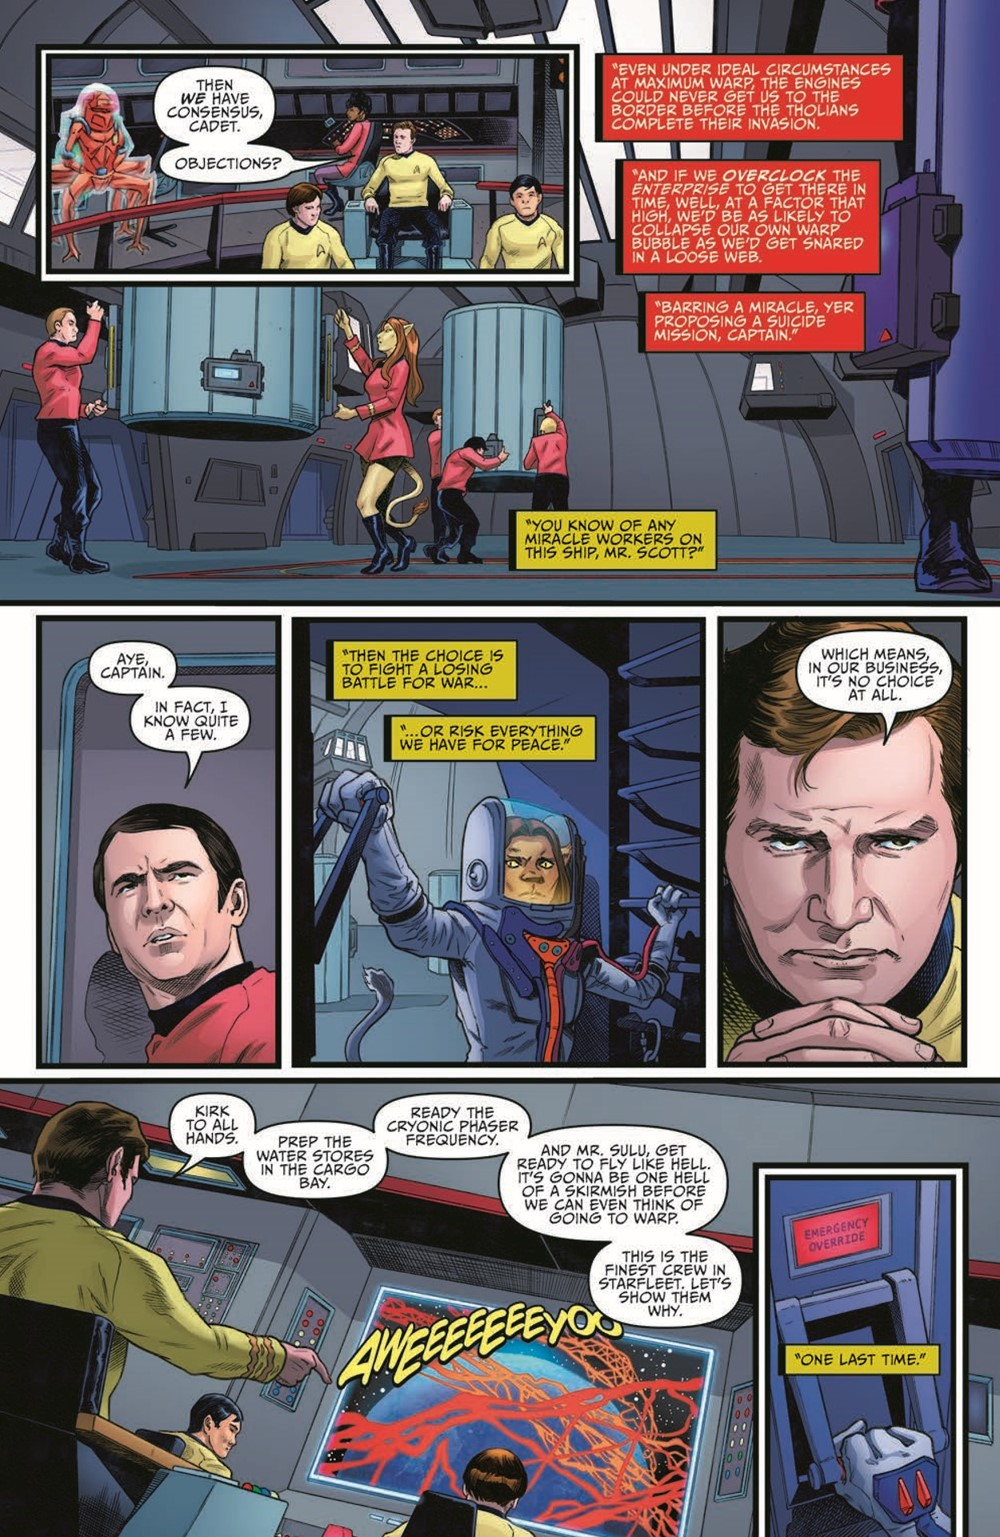 ST_YearFive23-pr-5 ComicList Previews: STAR TREK YEAR FIVE #23